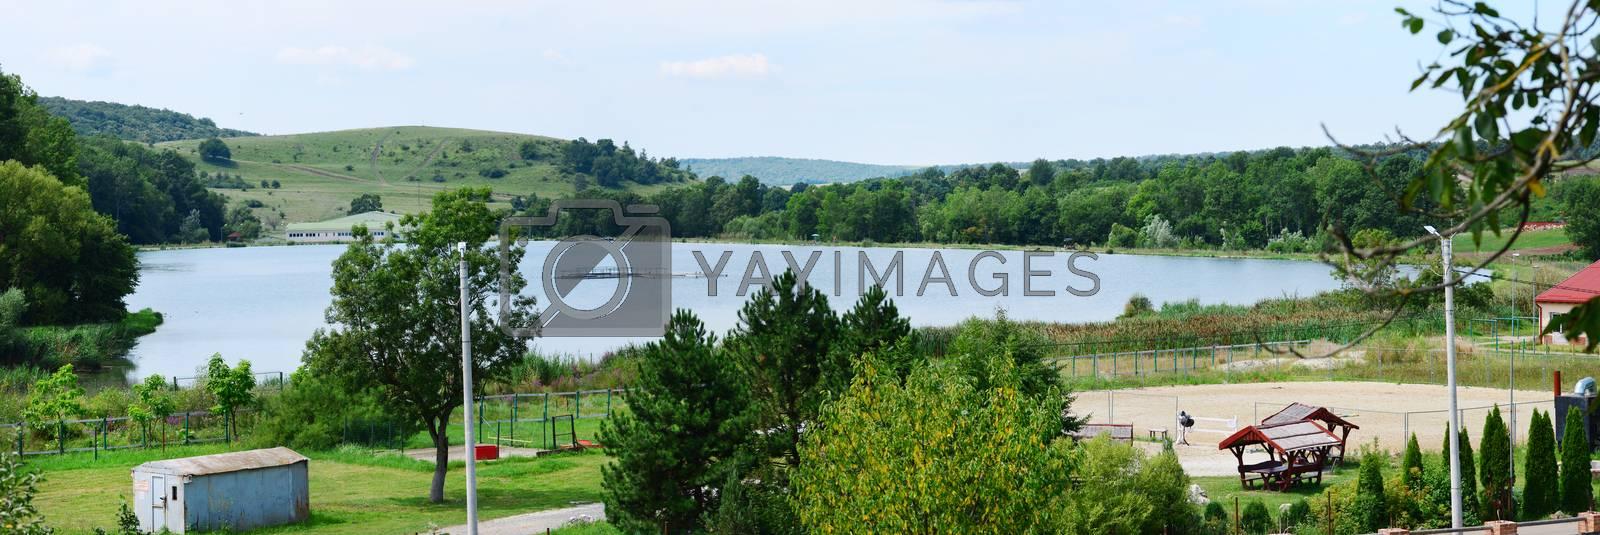 Royalty free image of Herneacova lake by tony4urban